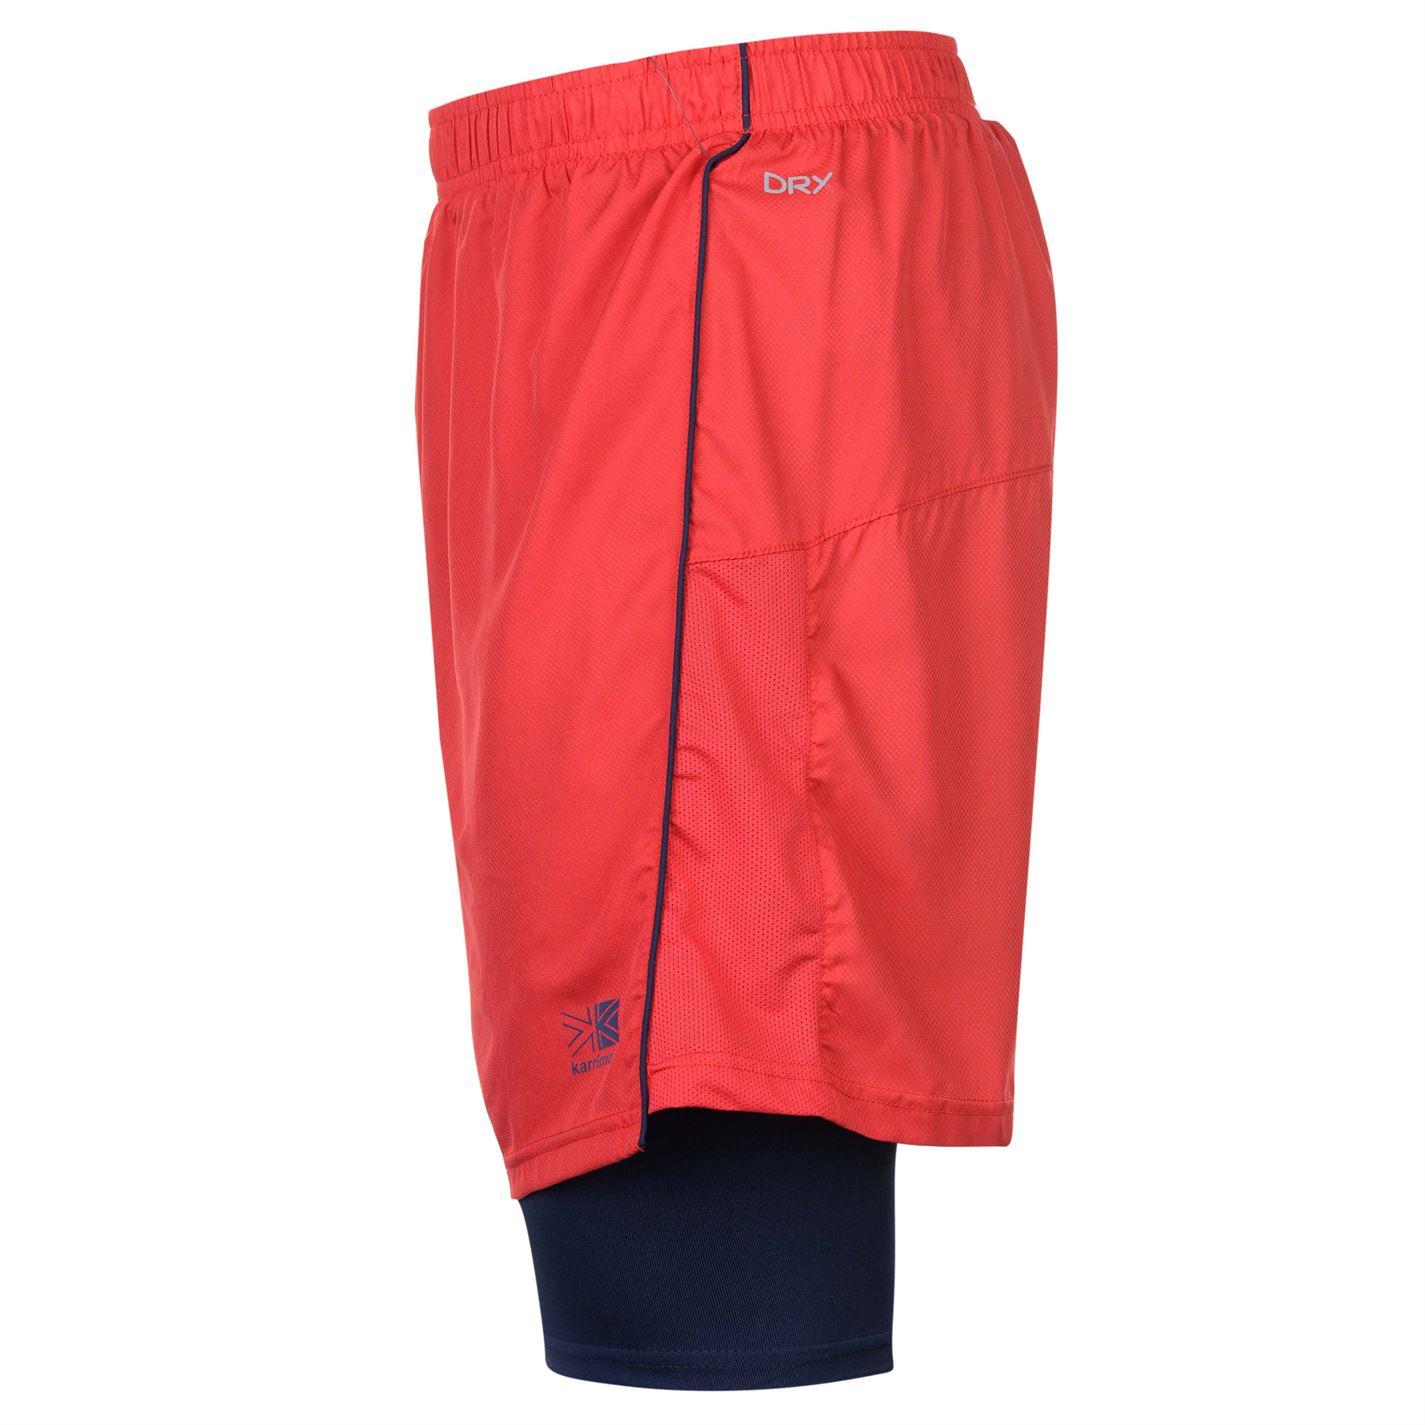 Karrimor-XLite-2in1-Shorts-Performance-Mens thumbnail 26